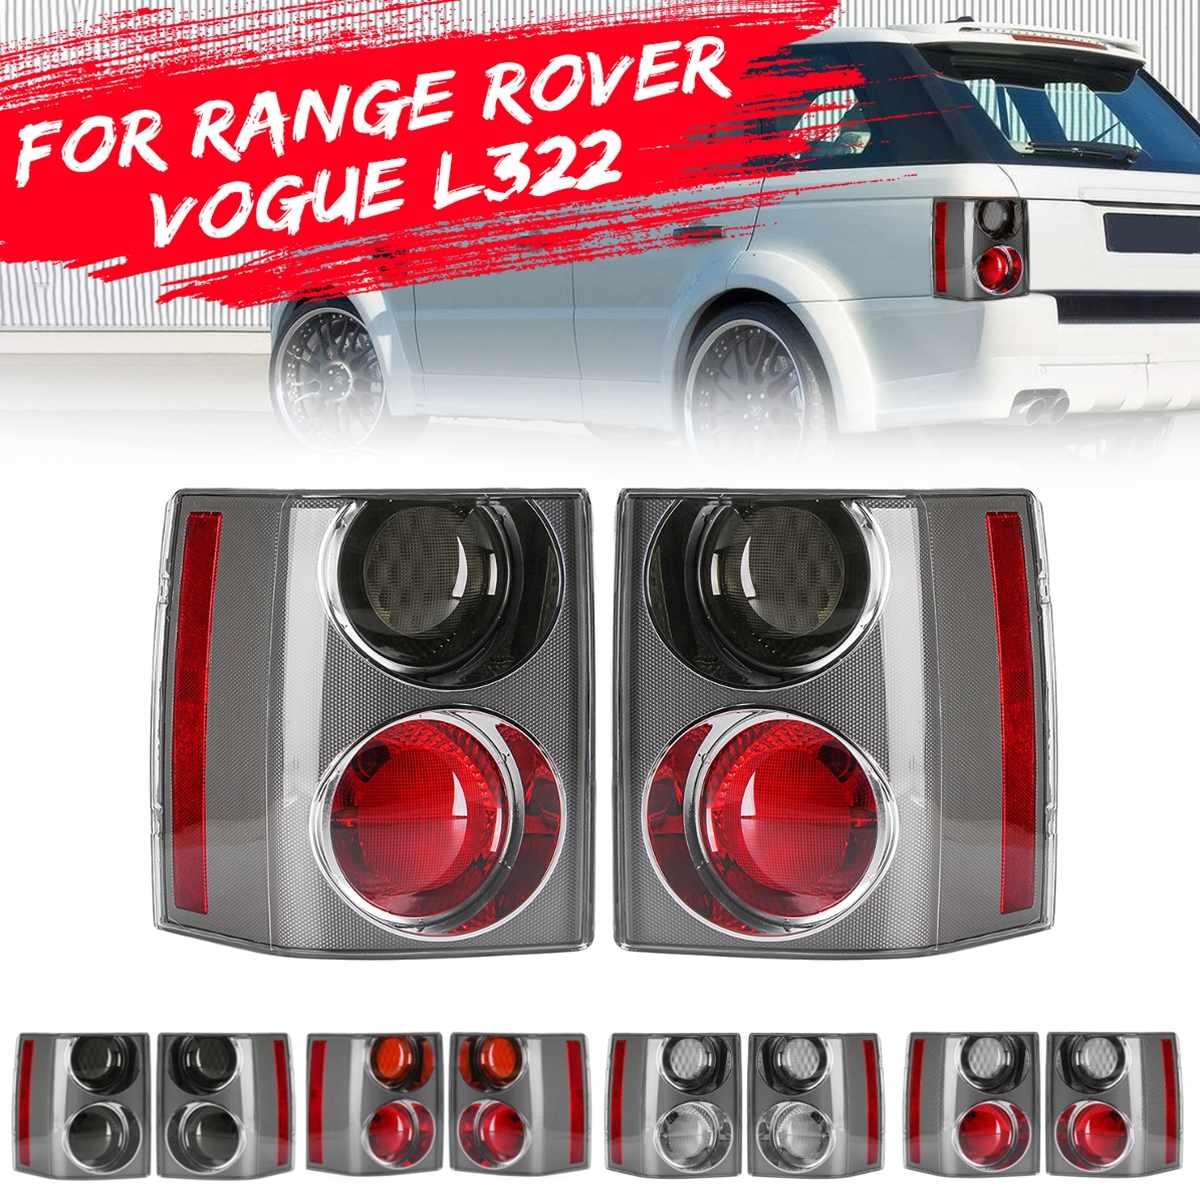 Back Light Wiring Diagram 2004 Range Rover: 2Pcs Car Tail Light FOR Land Rover RANGE ROVER /VOGUE L322